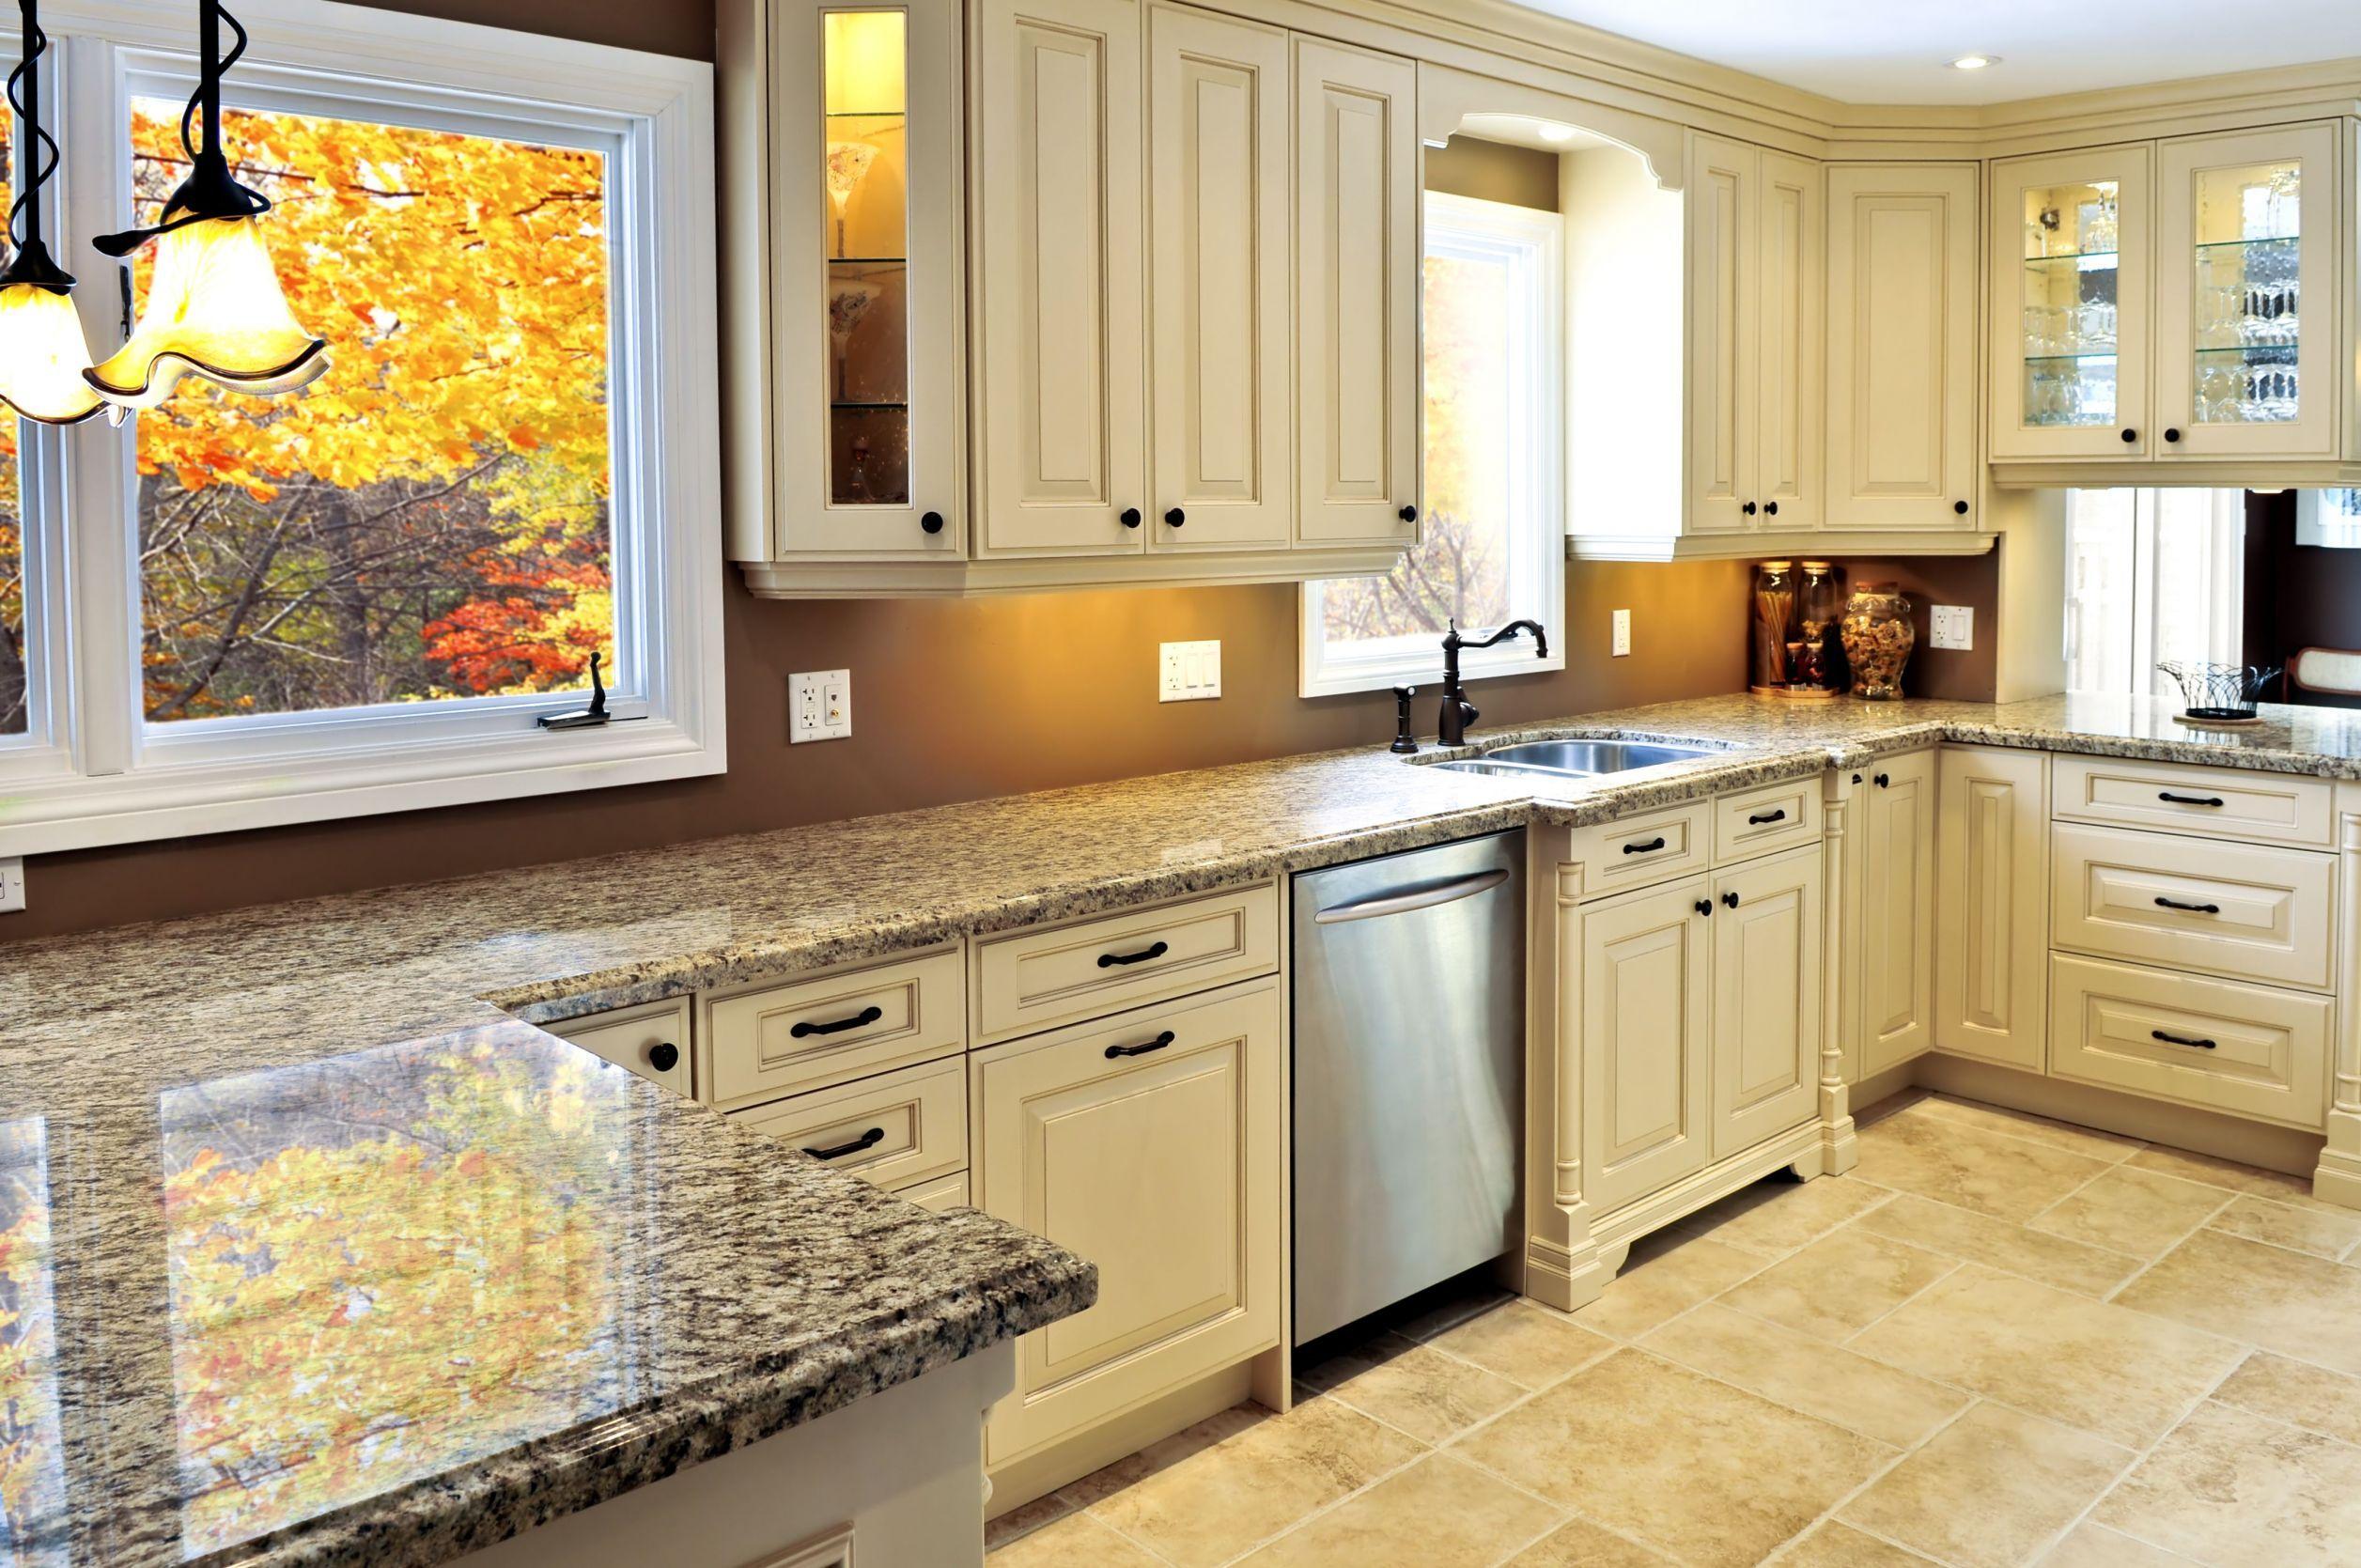 Wunderbare Ikea Quarz Arbeitsplatten Mit Marmor Kuche Insel Wunderbare Kuche Mit Quarz Arbeitsplatten Antique White Kitchen Classy Kitchen Kitchen Renovation